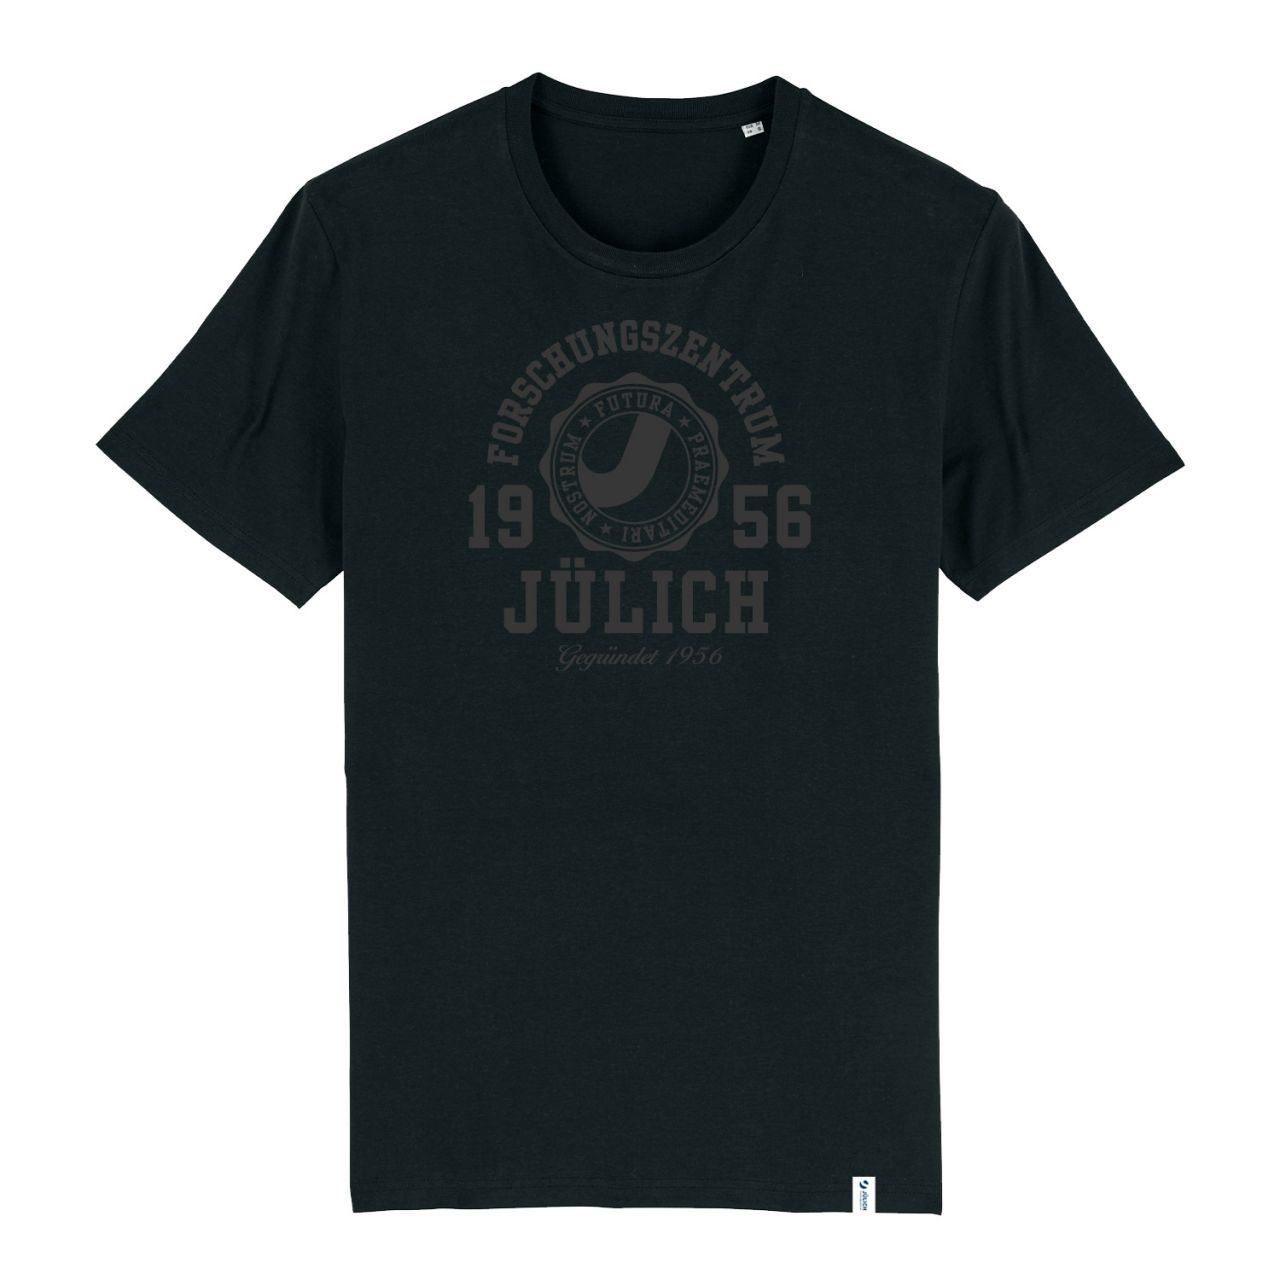 Men's Organic T-Shirt, black, marshall